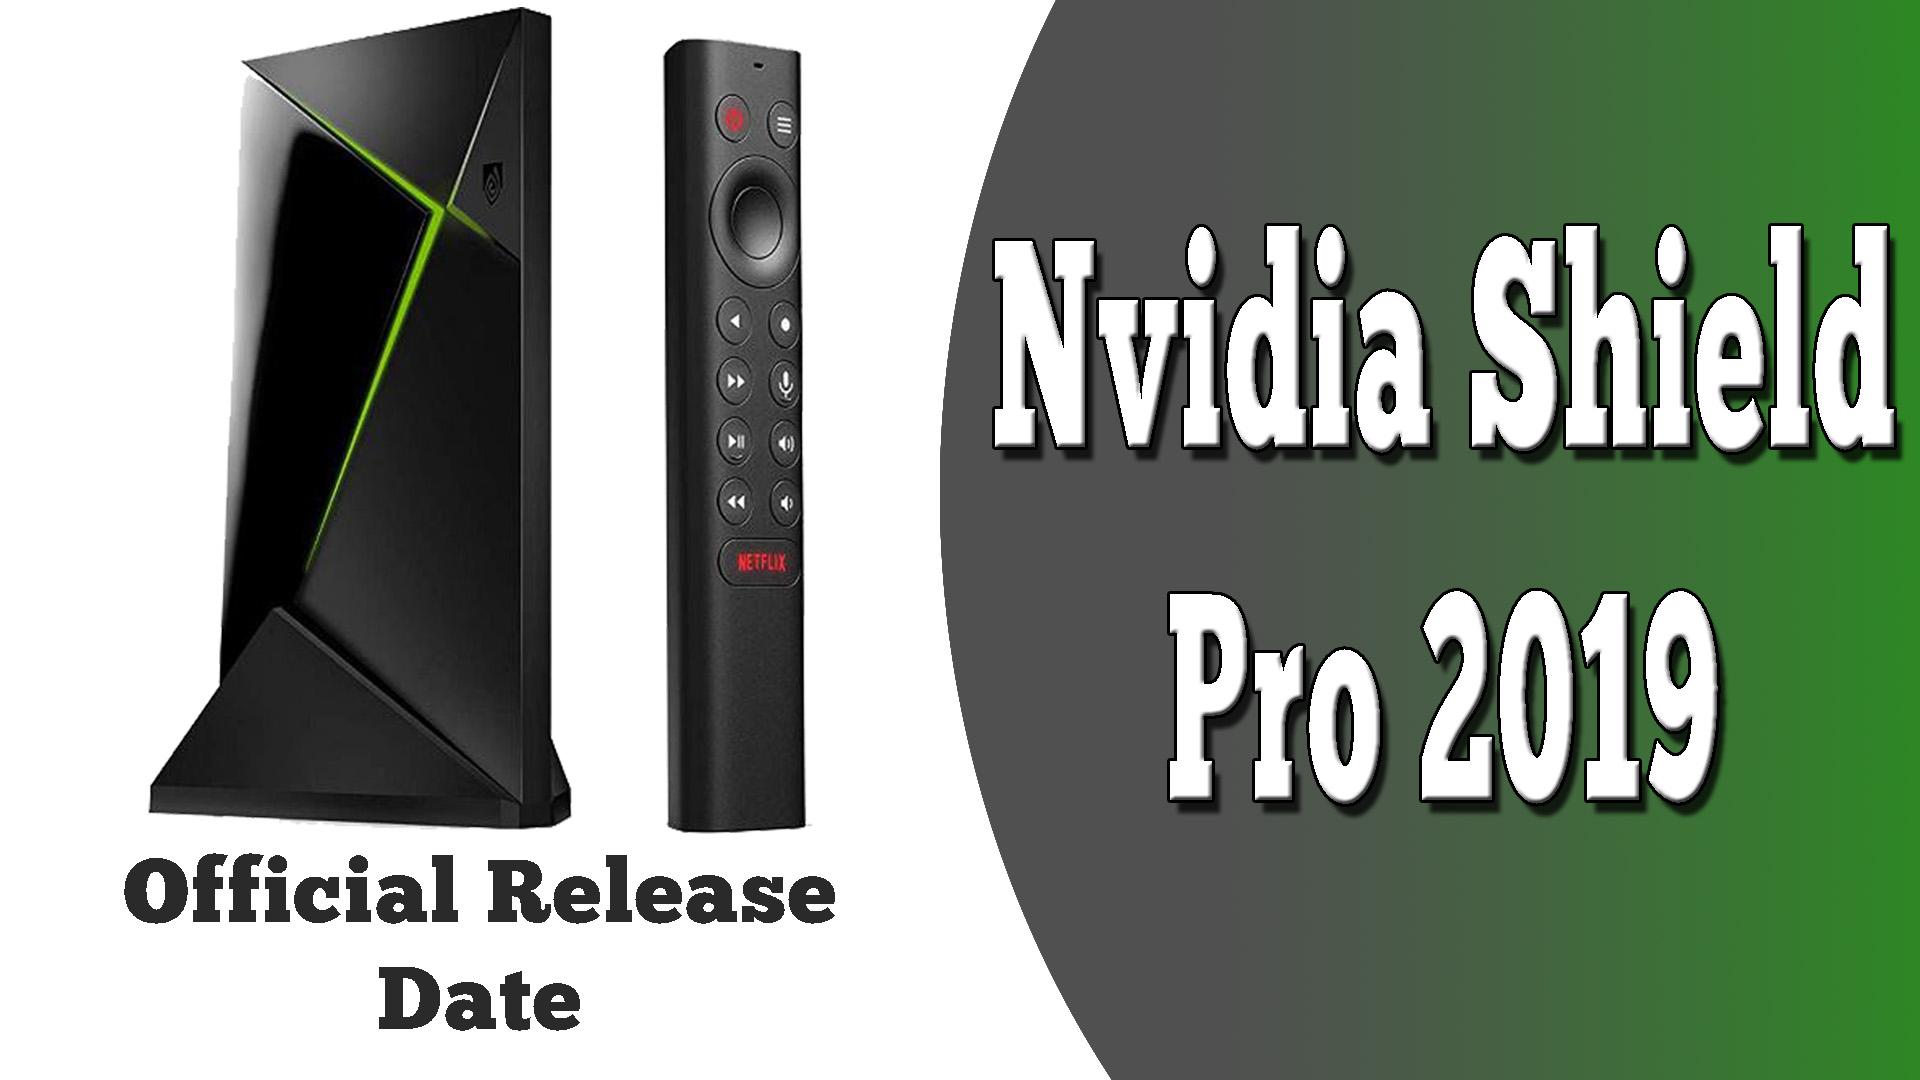 Nvidia Shield Pro 2019 release date